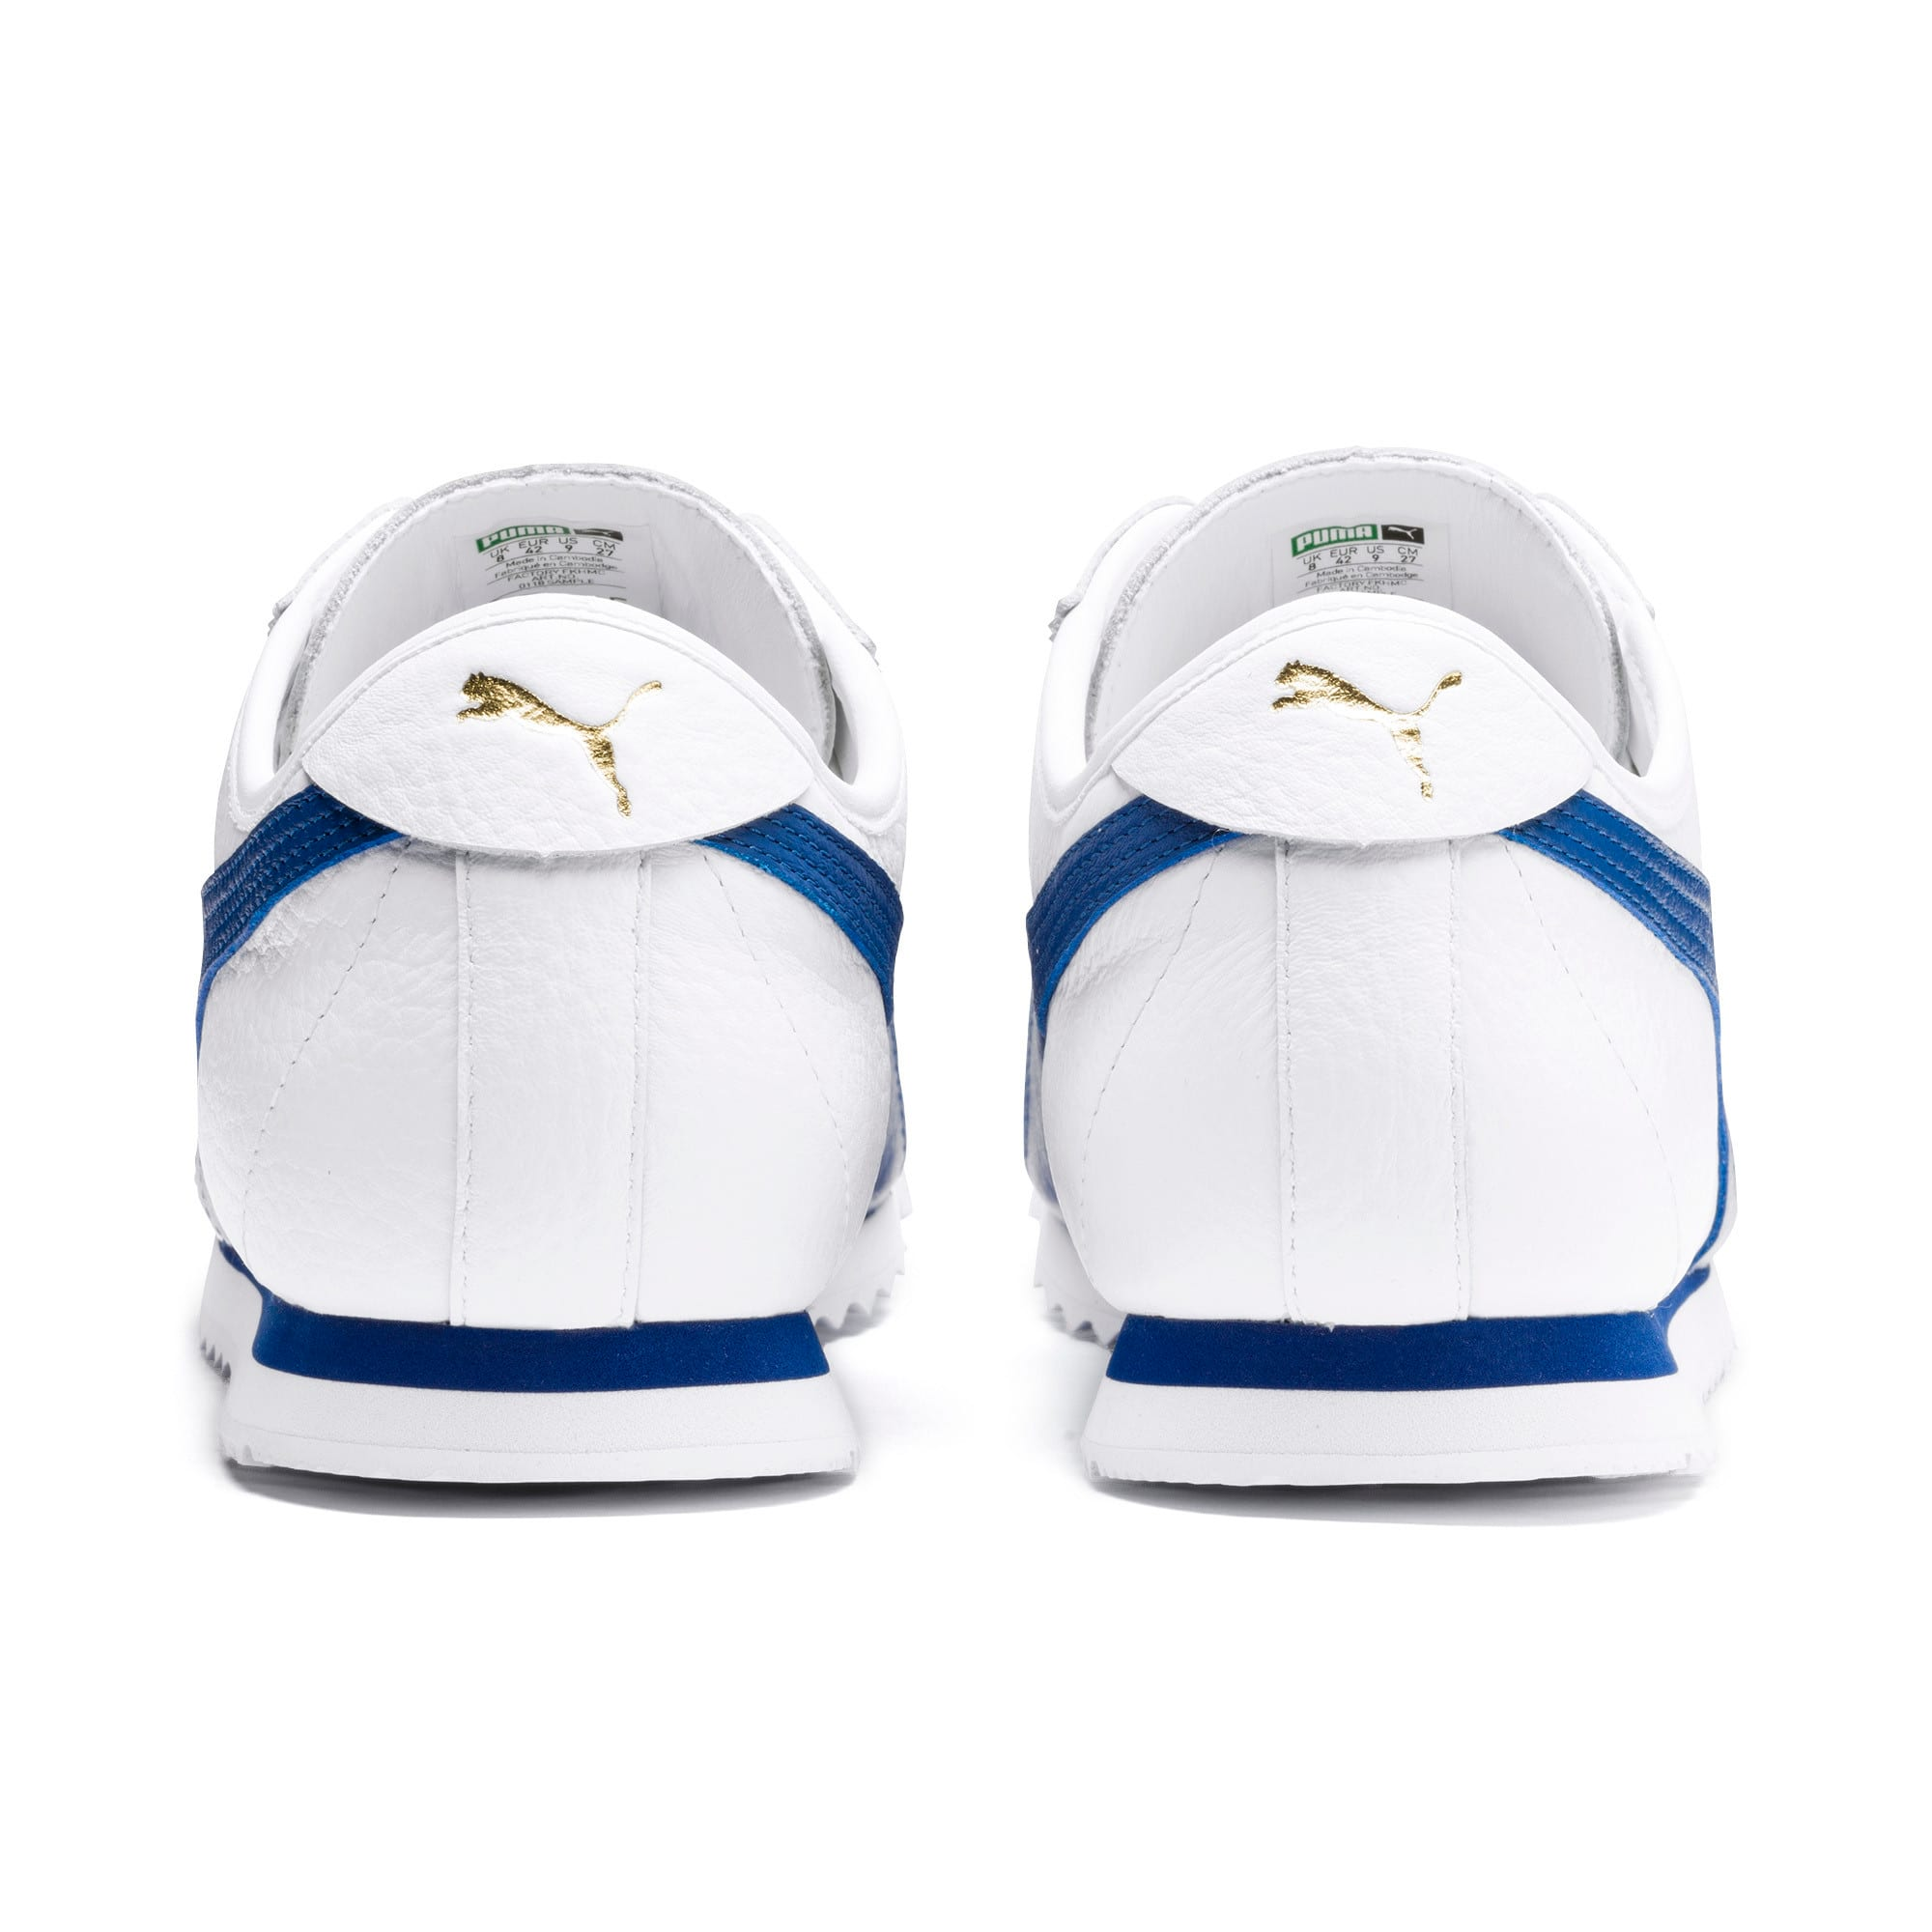 Miniatura 5 de Zapatos deportivos Roma '68 Vintage, Puma White-Galaxy Blue, mediano